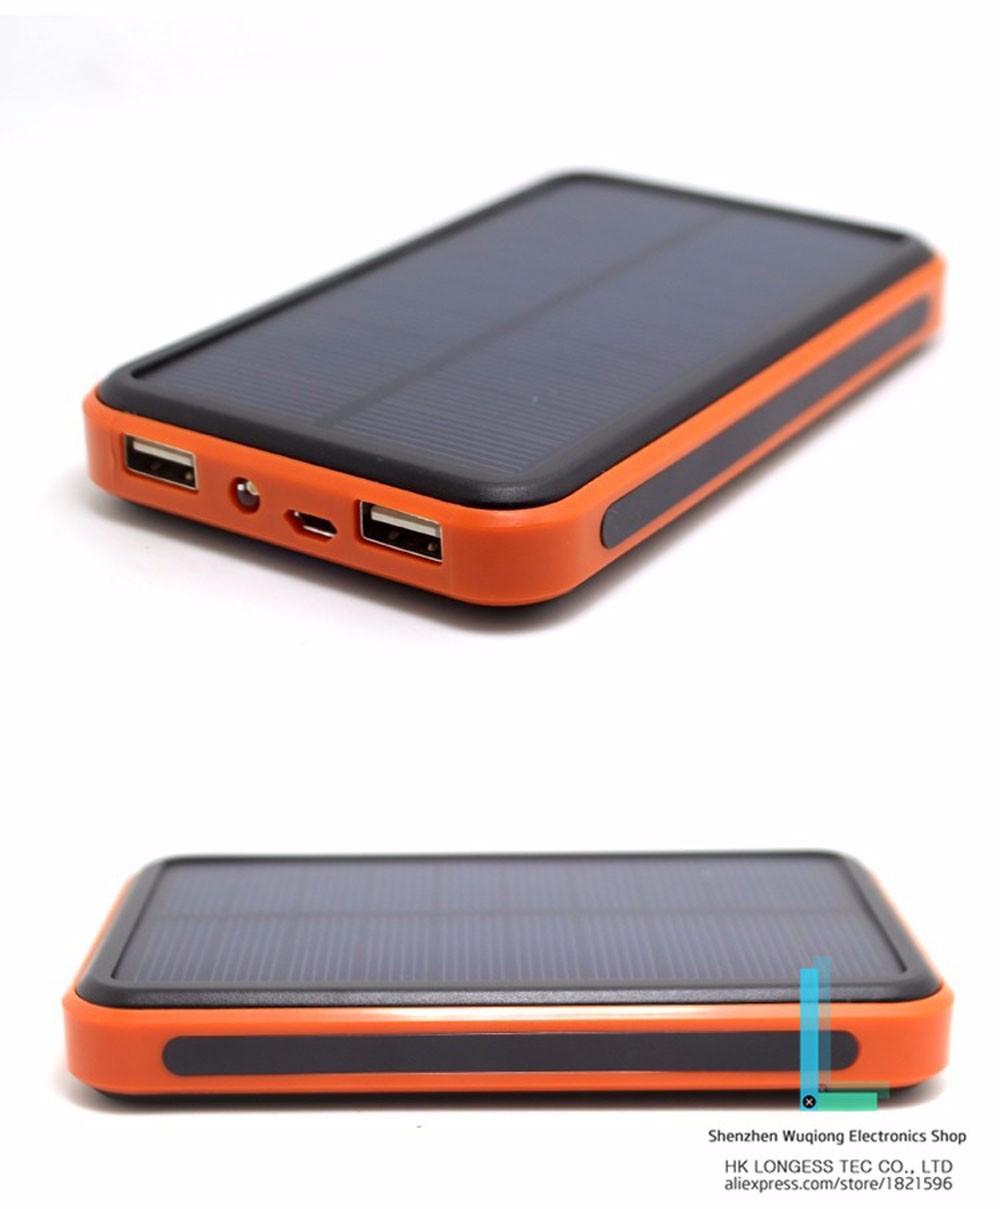 10000 mah Dual usb Waterproof solar power bank PowerCore bateria externa Portable solar charger powerbank for xaomi mobile phone(China (Mainland))